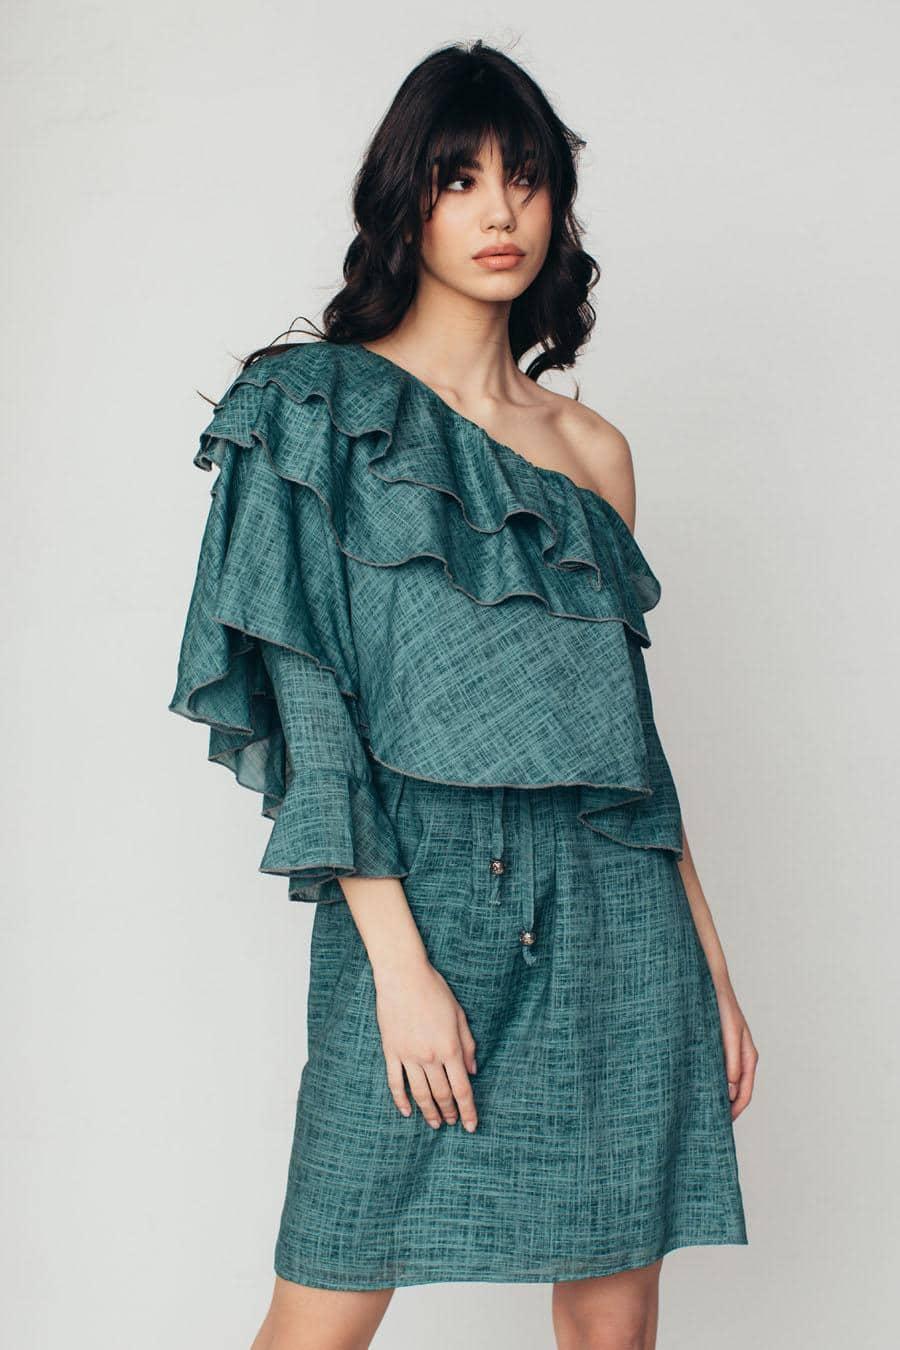 jagger zenska haljina kolekcija prolece leto 2021 ss 2021 kupi online jg 5504 13 03